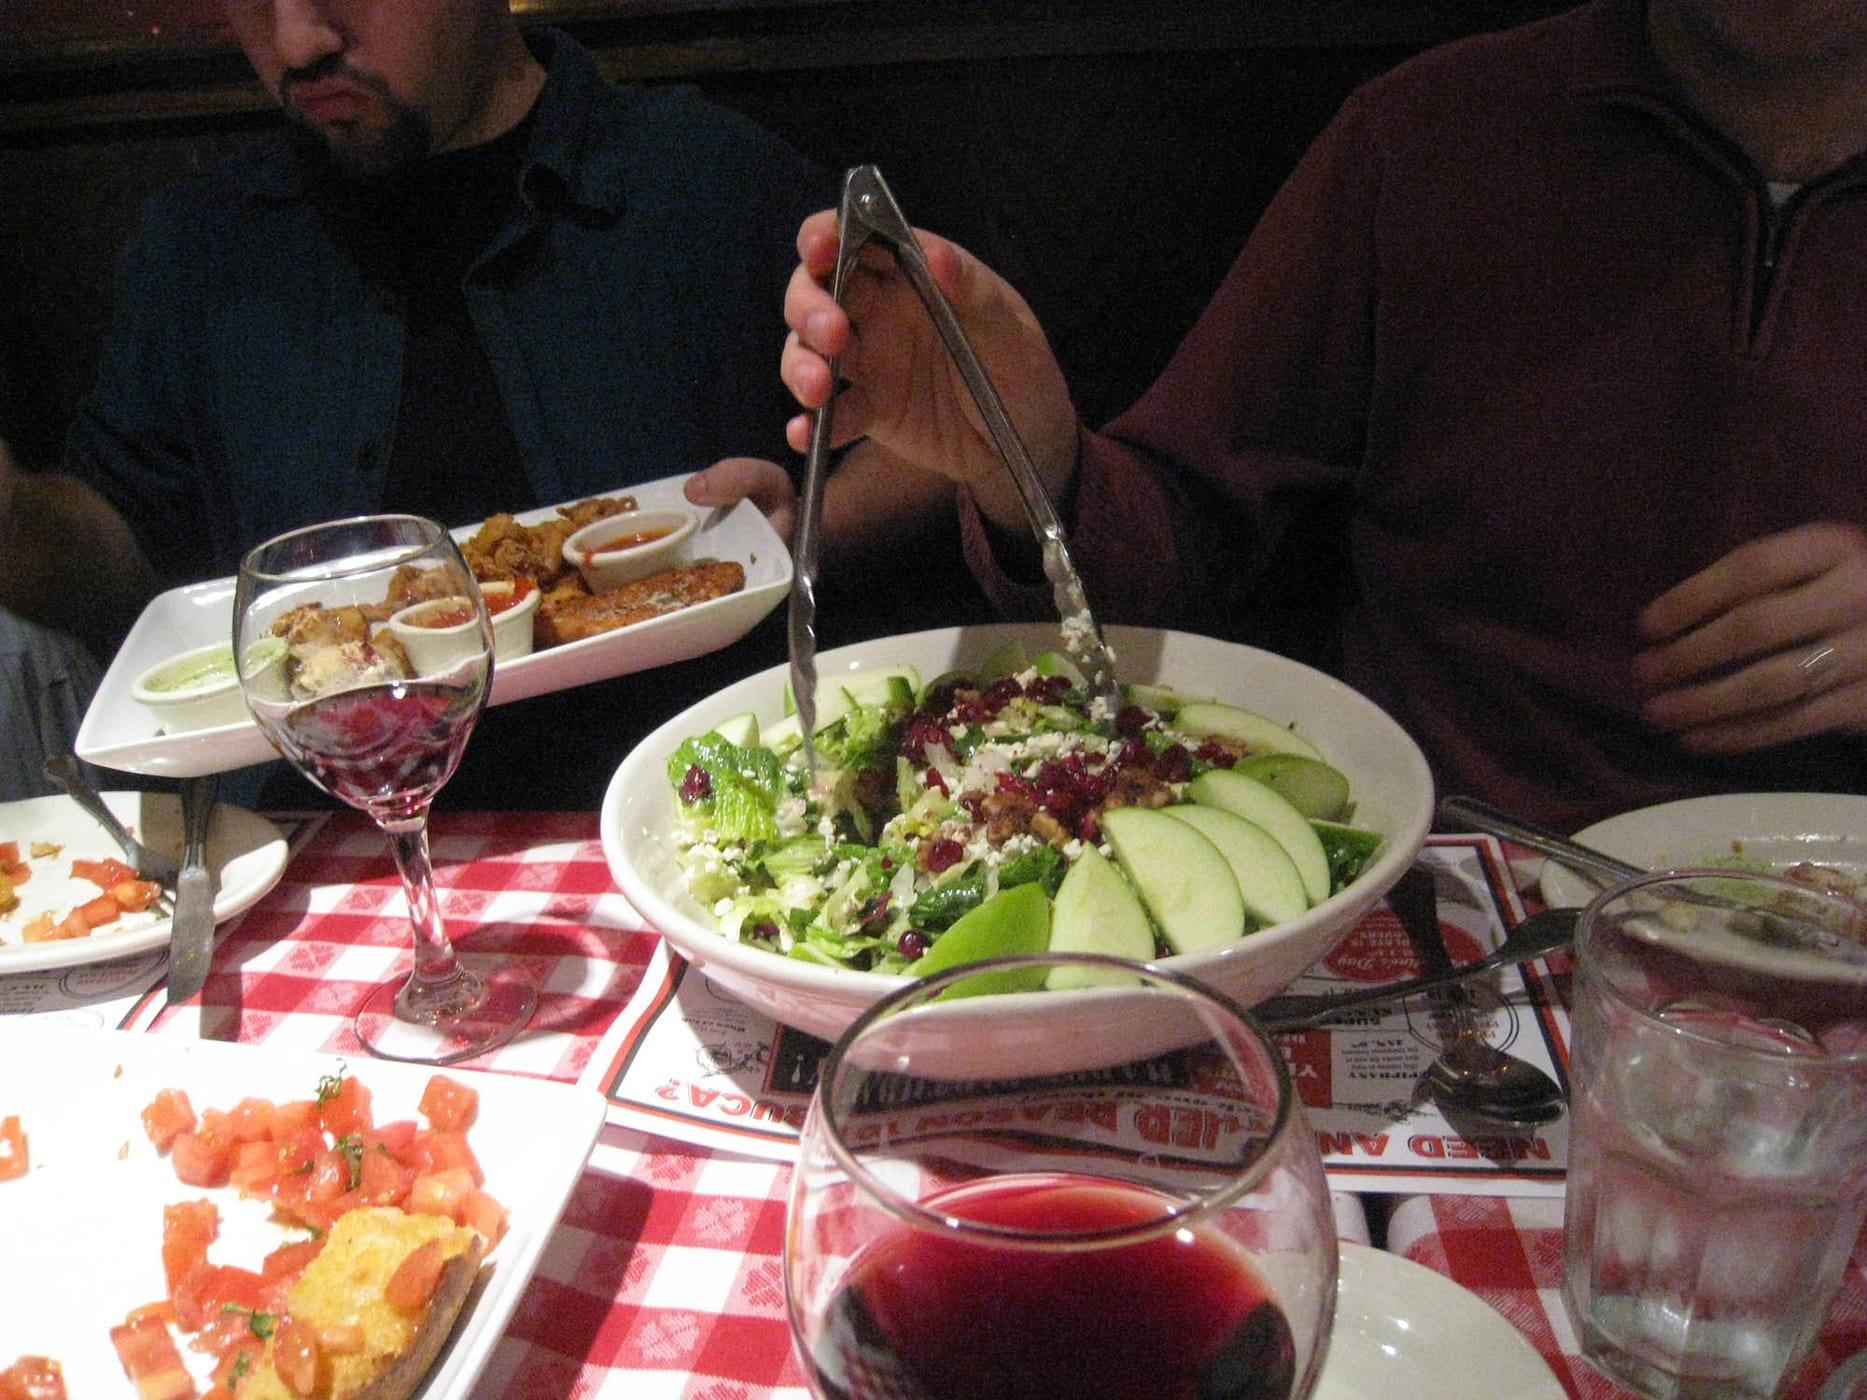 Apple Gorgonzola Salad at Bucca di Beppo